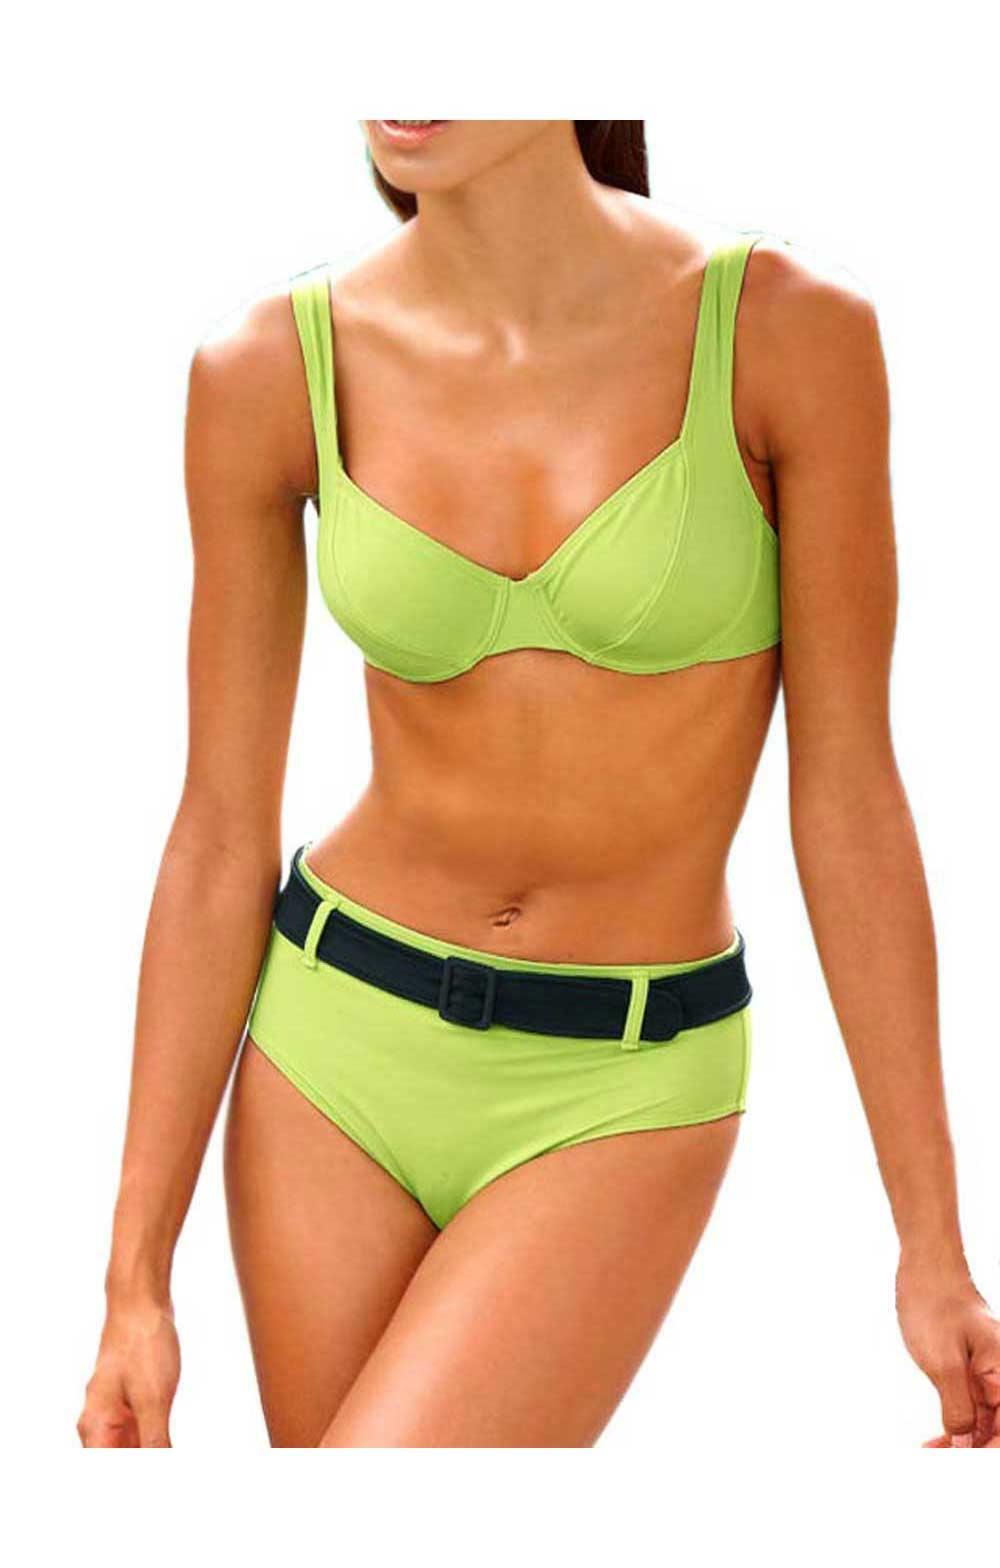 Body shaping bikinis